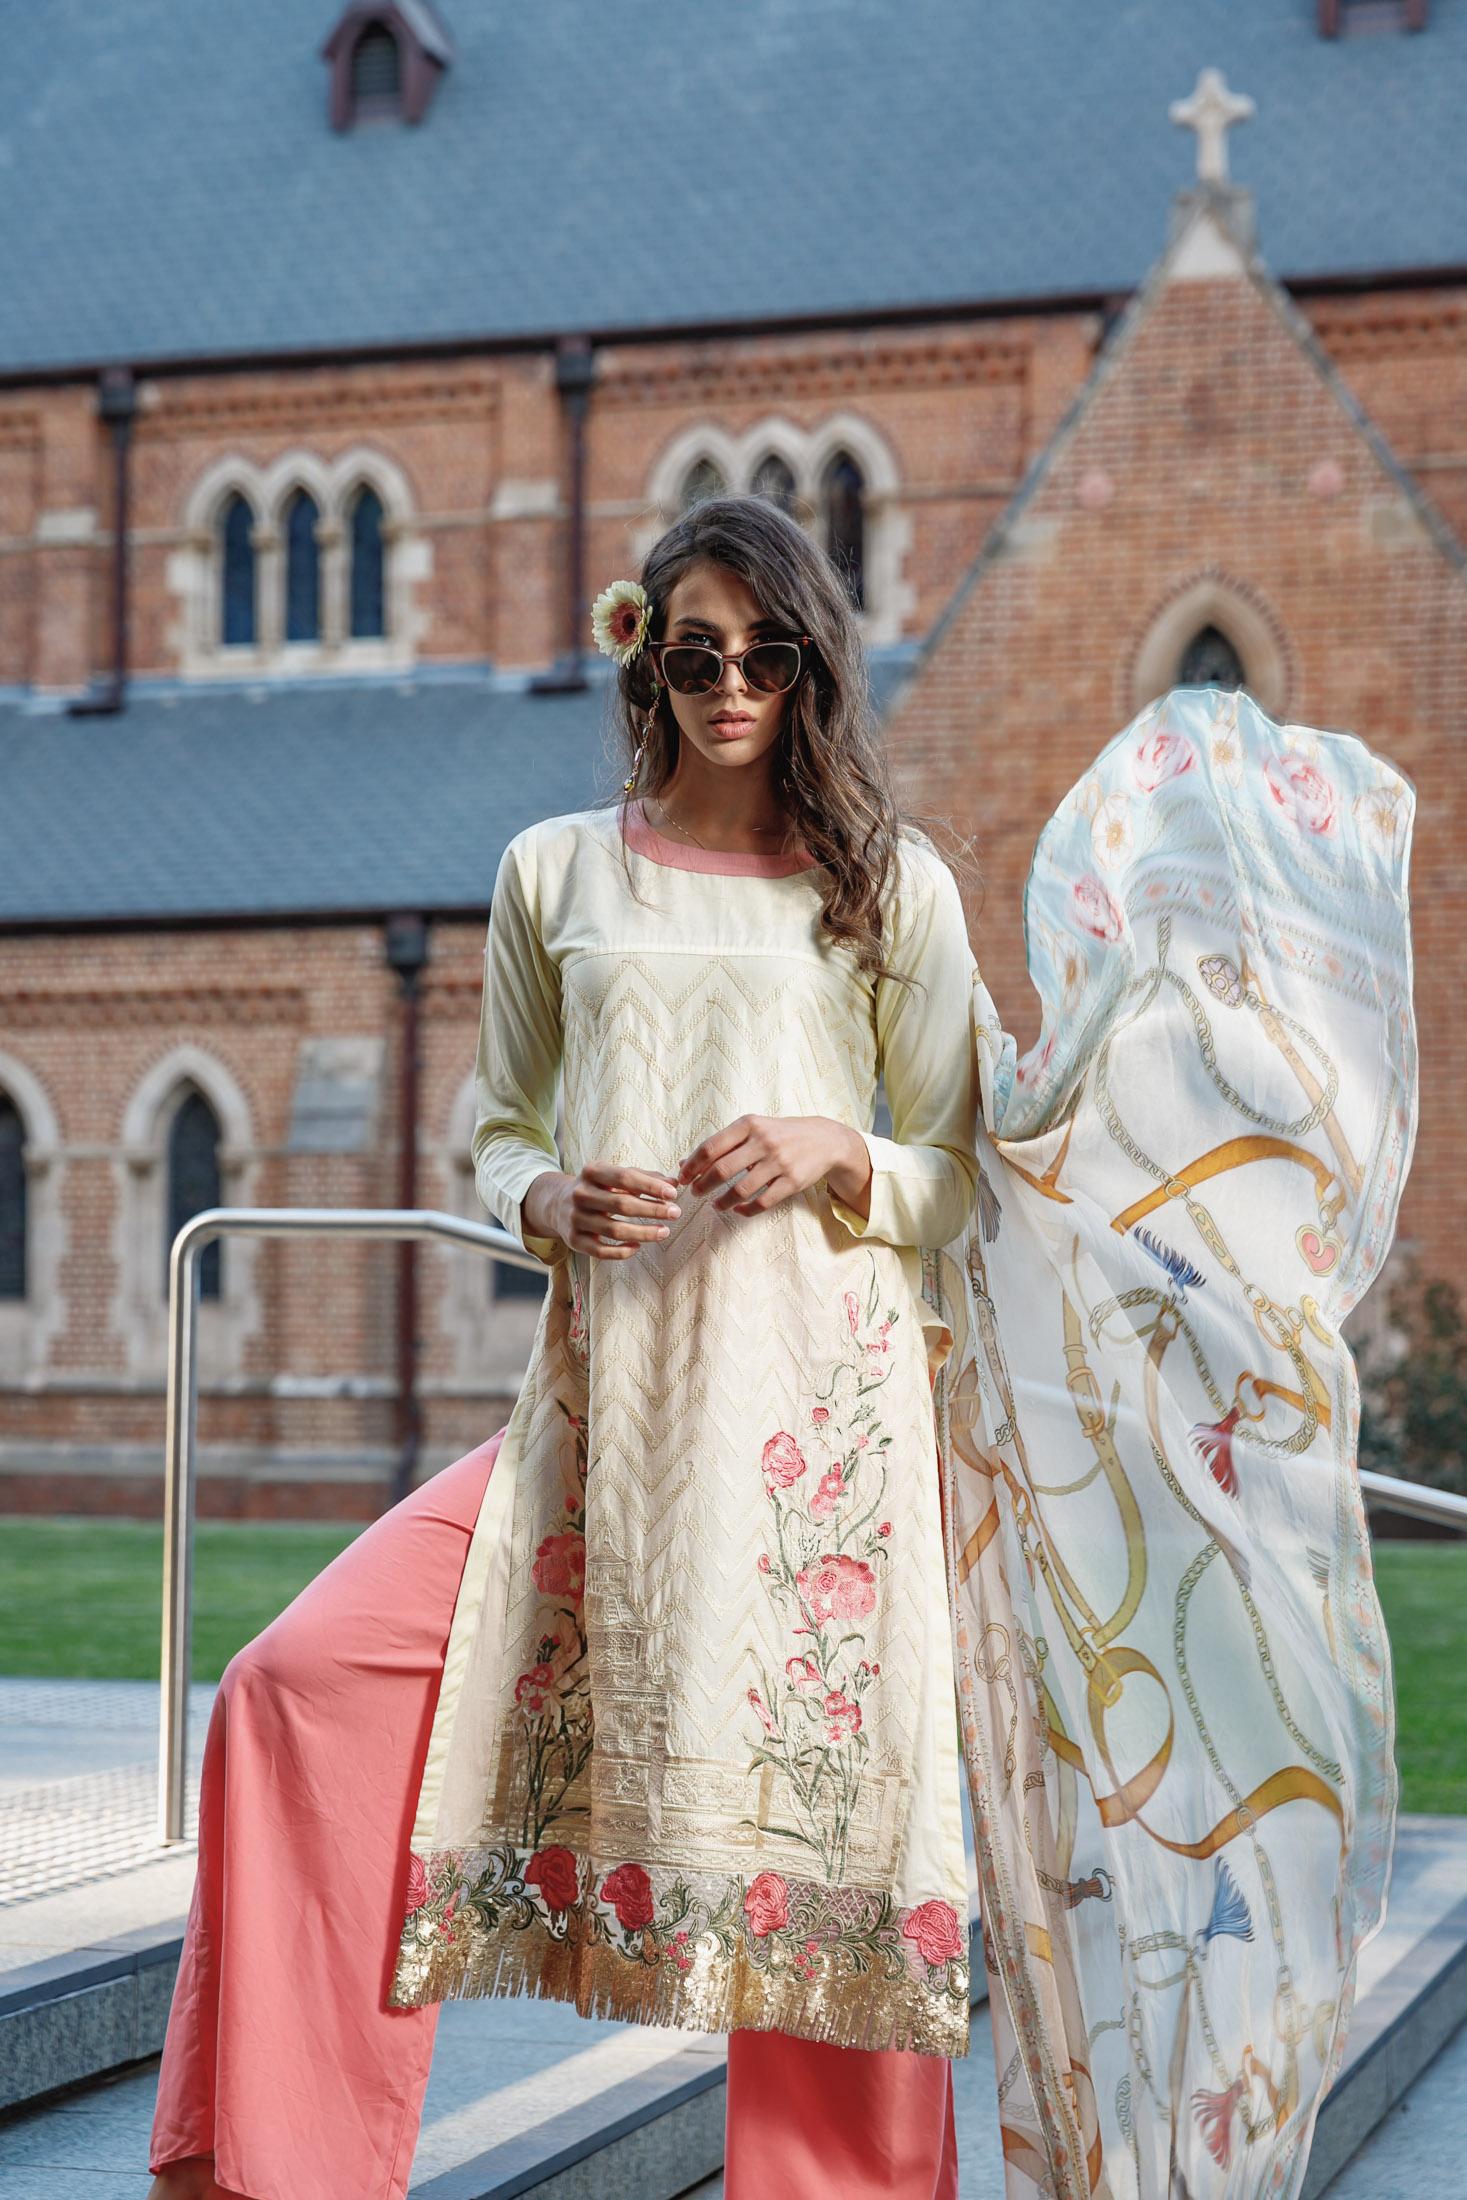 Ammon_Creative-Fashion_Photography-Vogue_Sultana_Bangladesh-Old_Treasury-Perth-008-1493.jpg